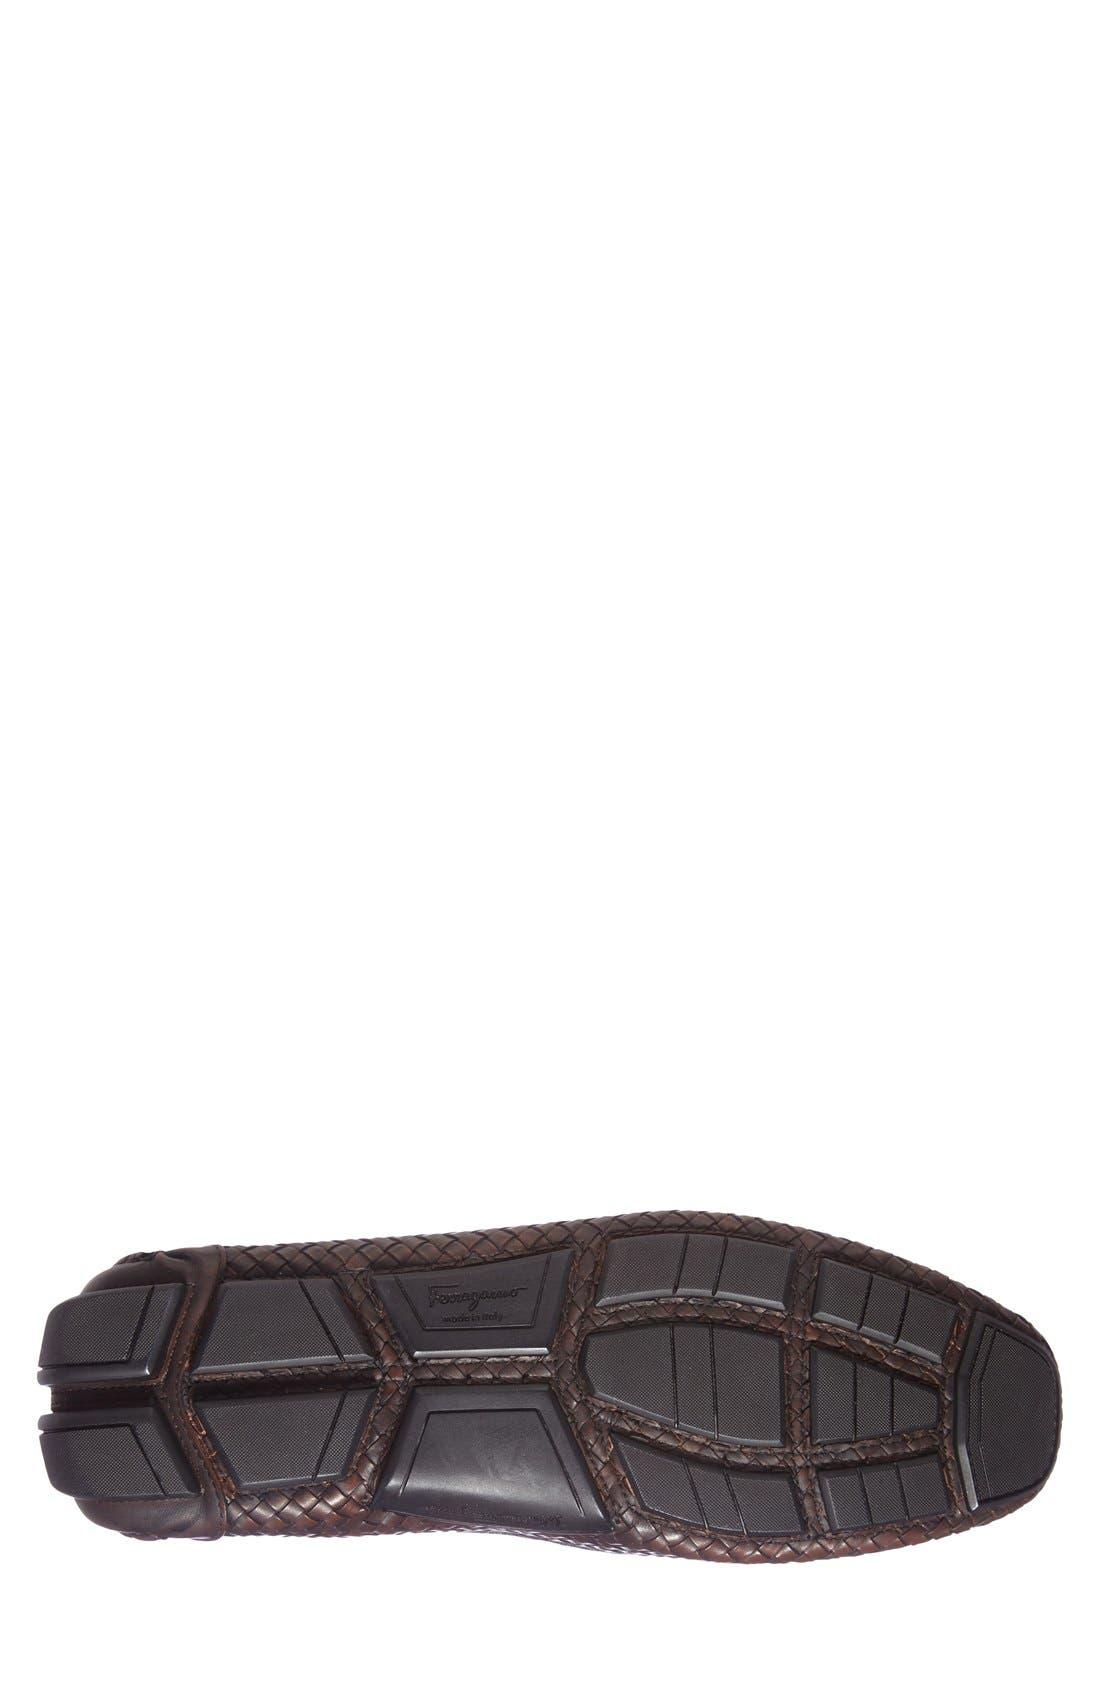 'Parigi' Woven Bit Loafer,                             Alternate thumbnail 4, color,                             Brown Hen/ T Moro Leather